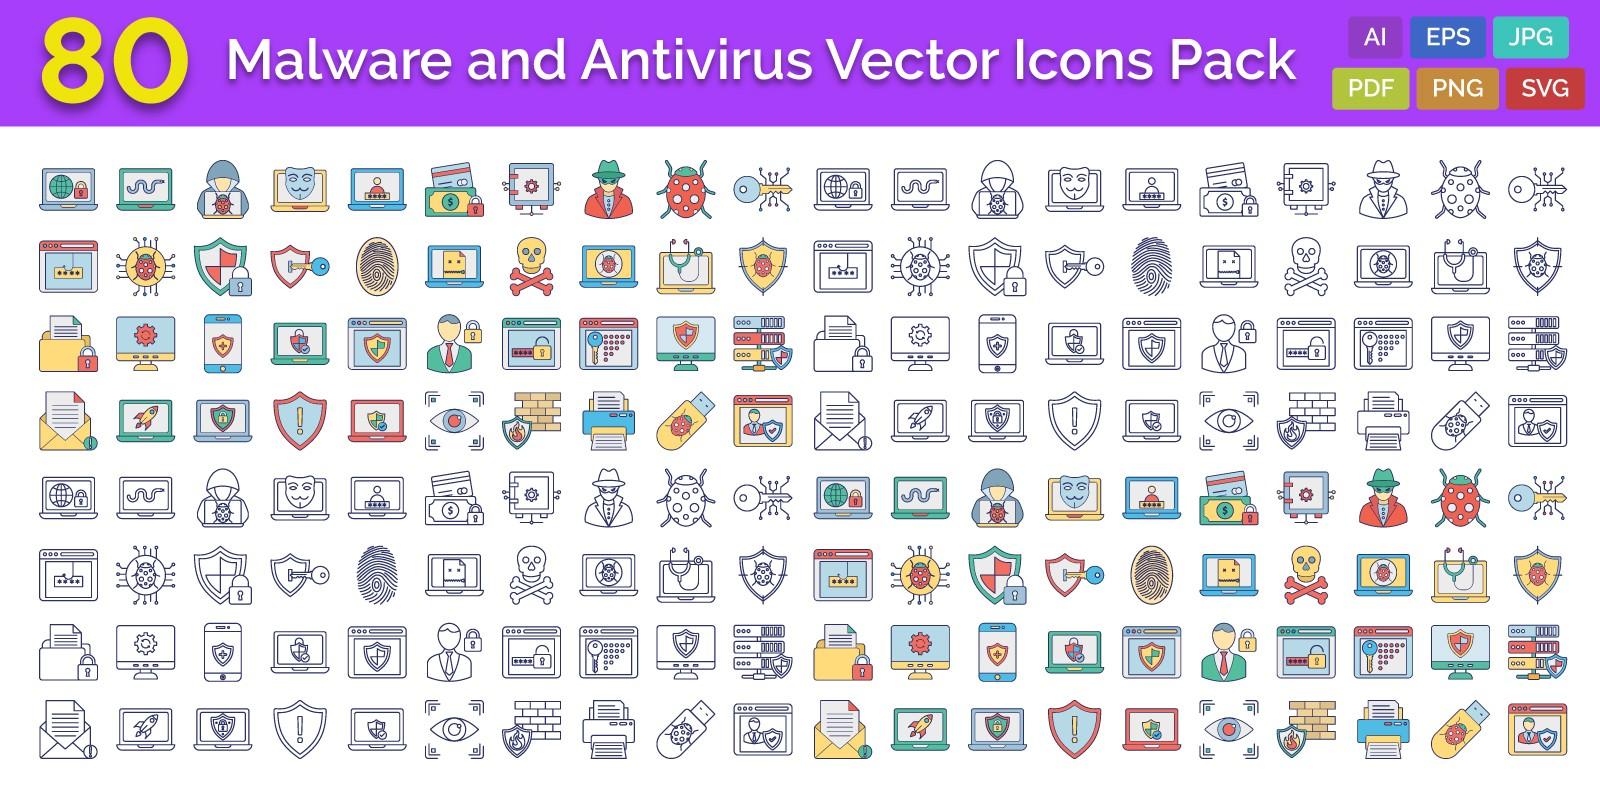 Malware And Antivirus Vector Icons Pack